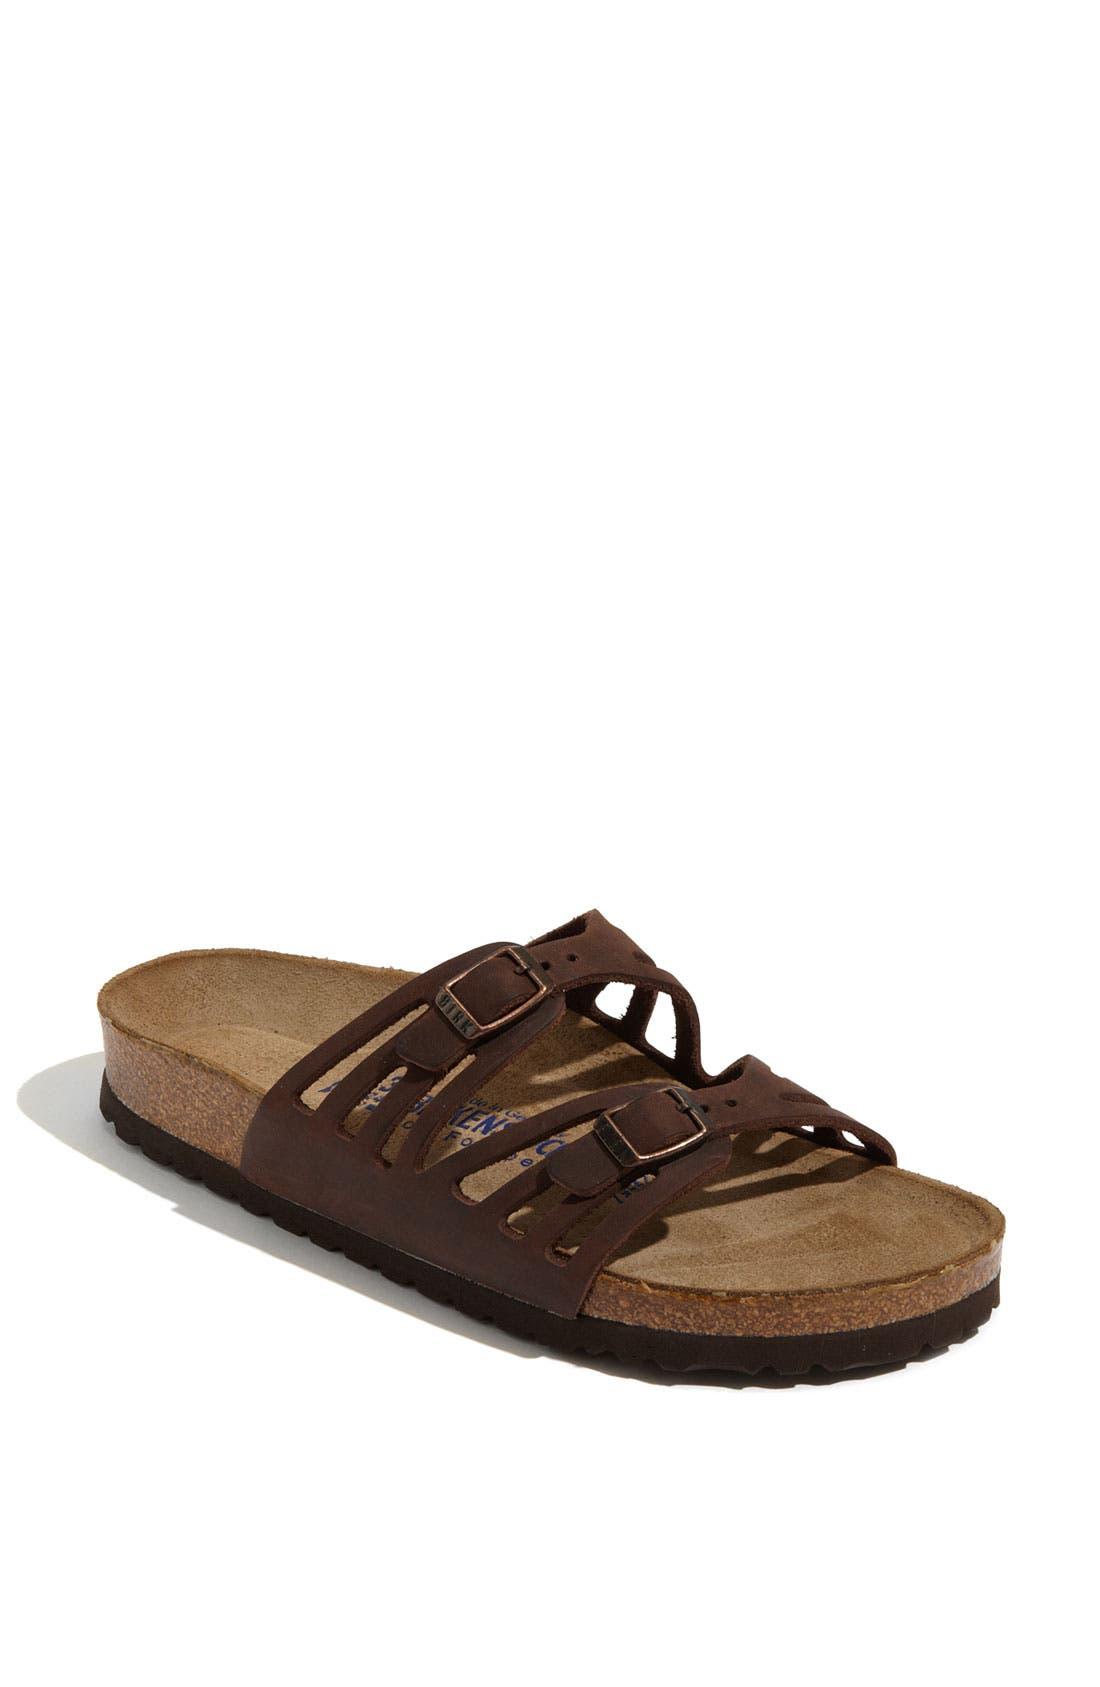 Main Image - Birkenstock Granada Soft Footbed Oiled Leather Sandal (Women)